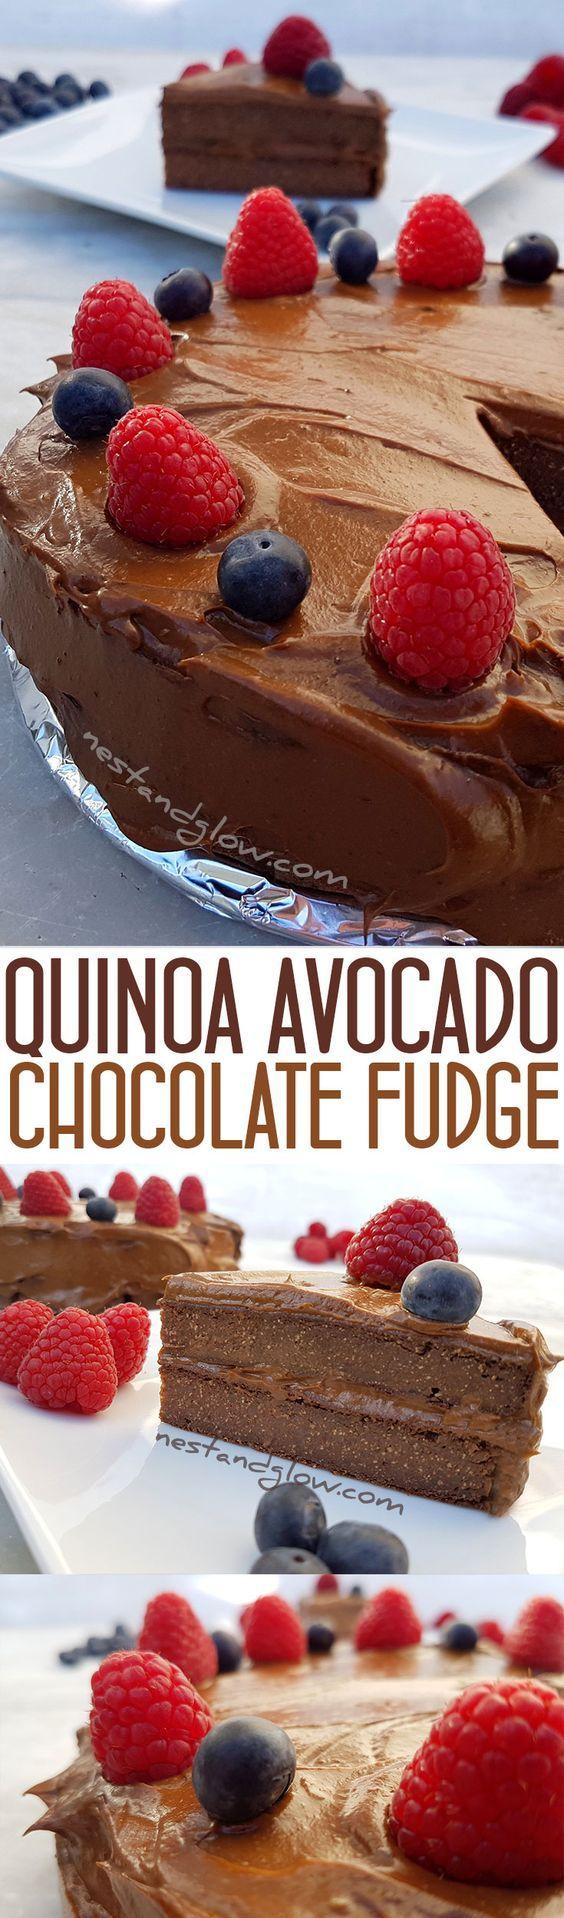 Quinoa Avocado Chocolate Fudge Cake Recipe - Vegan, gluten-free and healthy  via @nestandglow